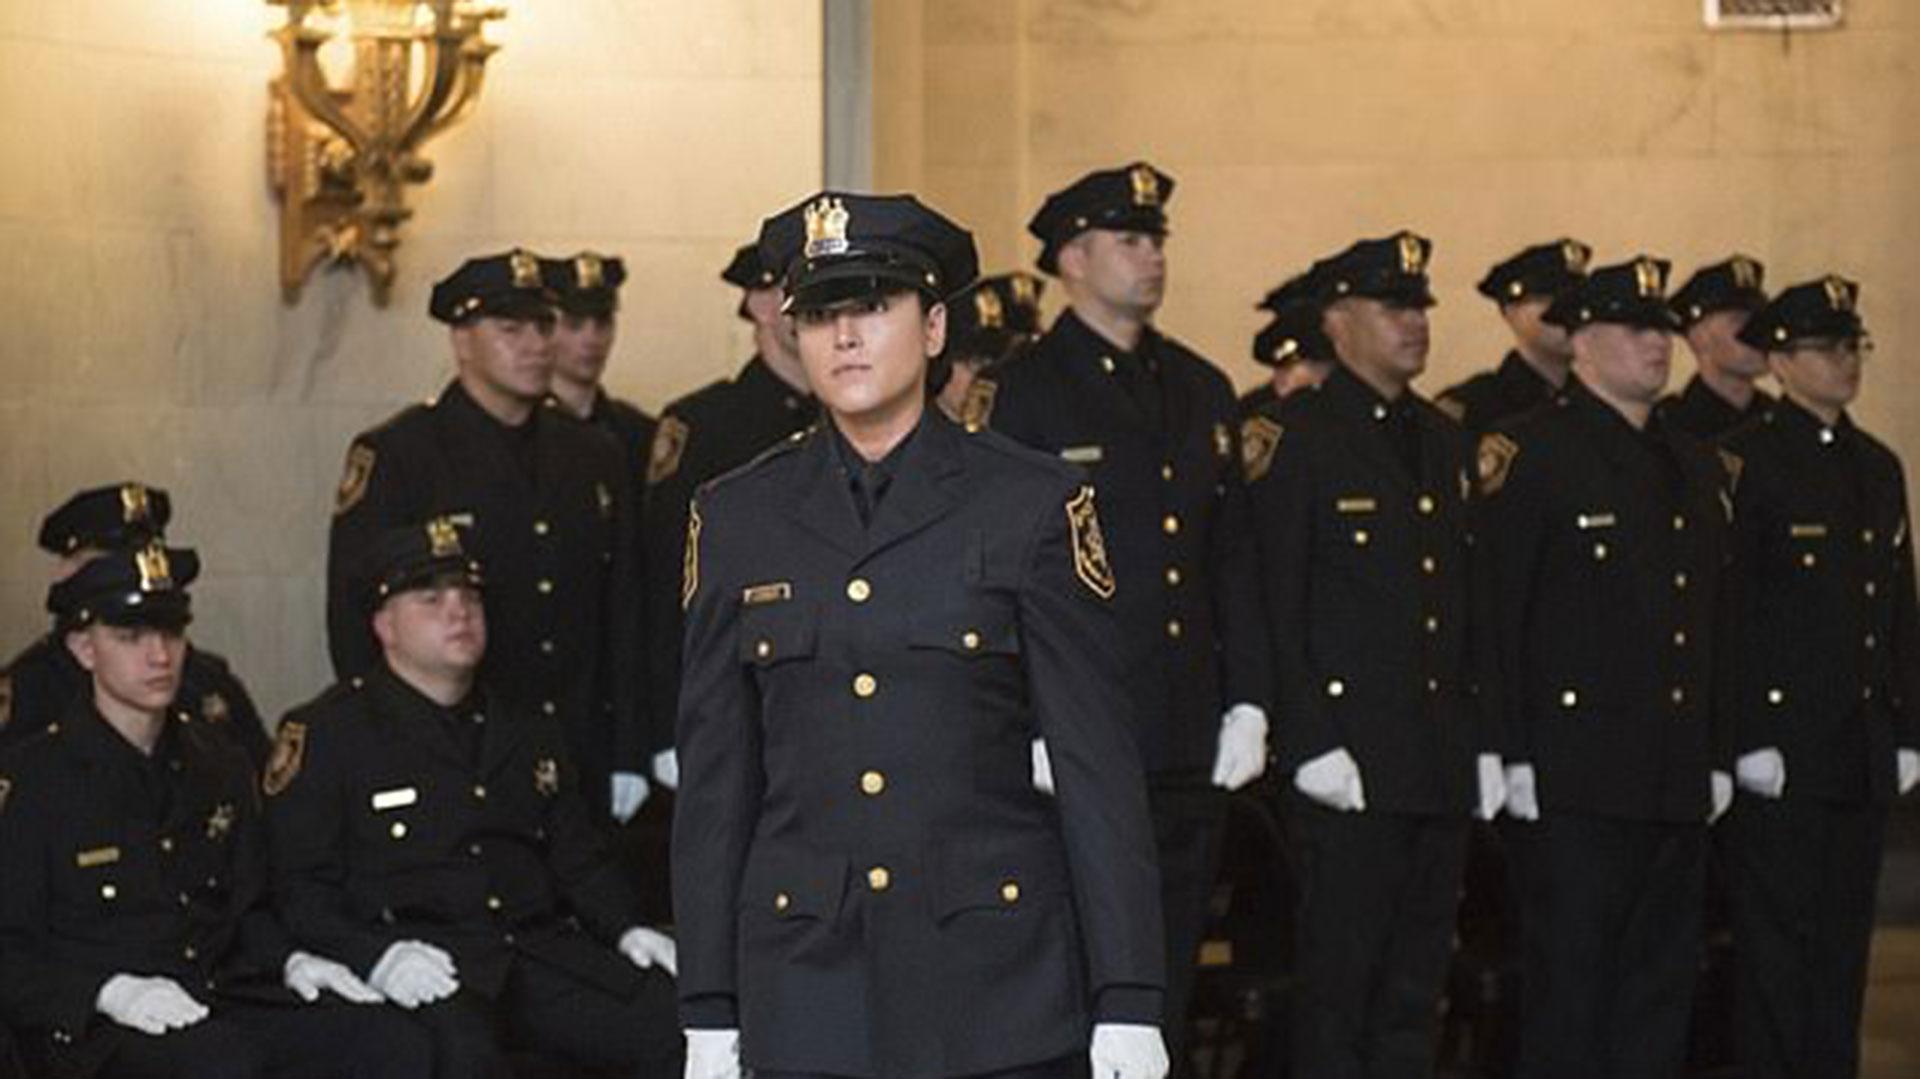 Actrices Porno Vestidas De Policia se enroló como policía, descubrieron que era actriz de porno